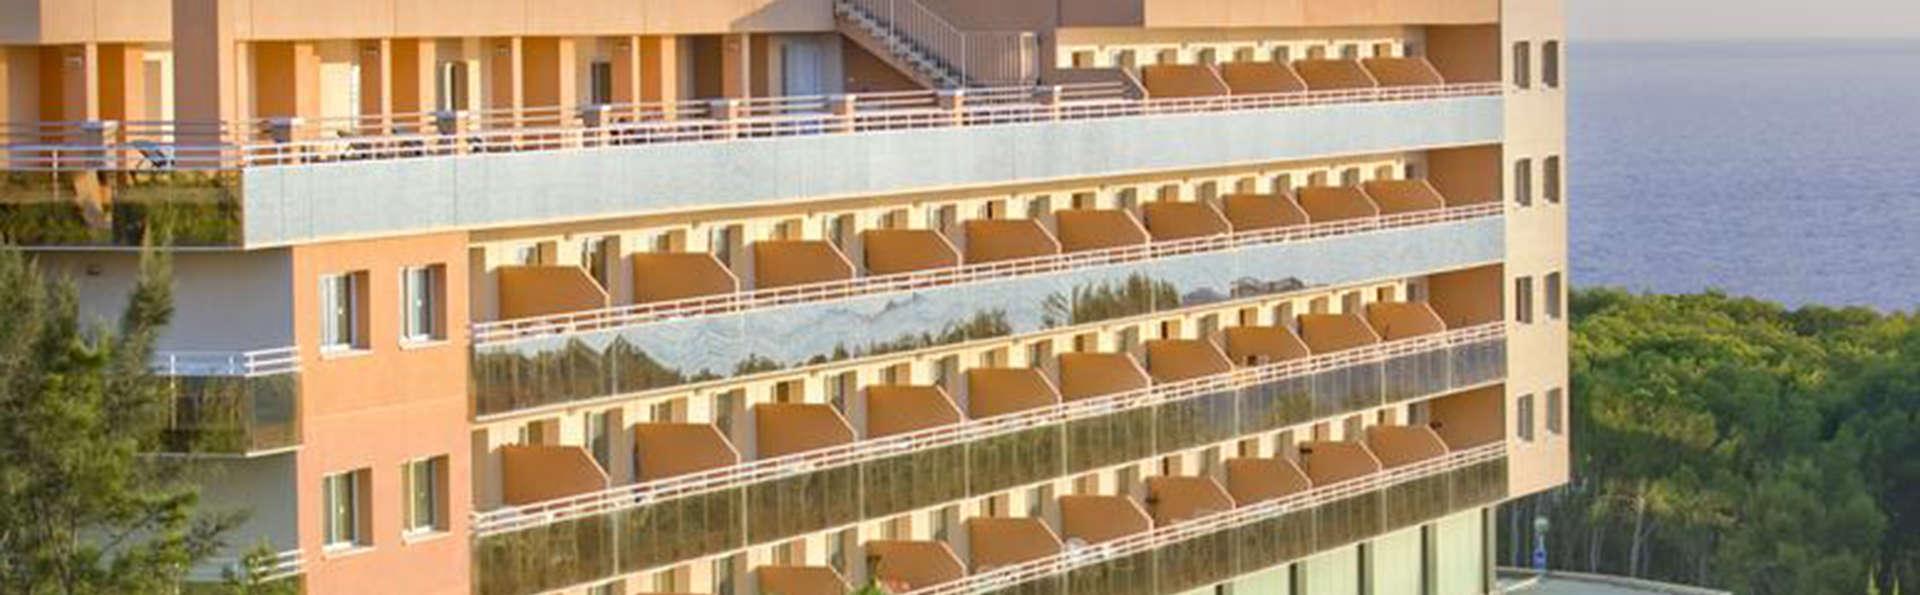 Aparthotel SunClub Salou - EDIT_SUNCLUB_SALOU_14.jpg